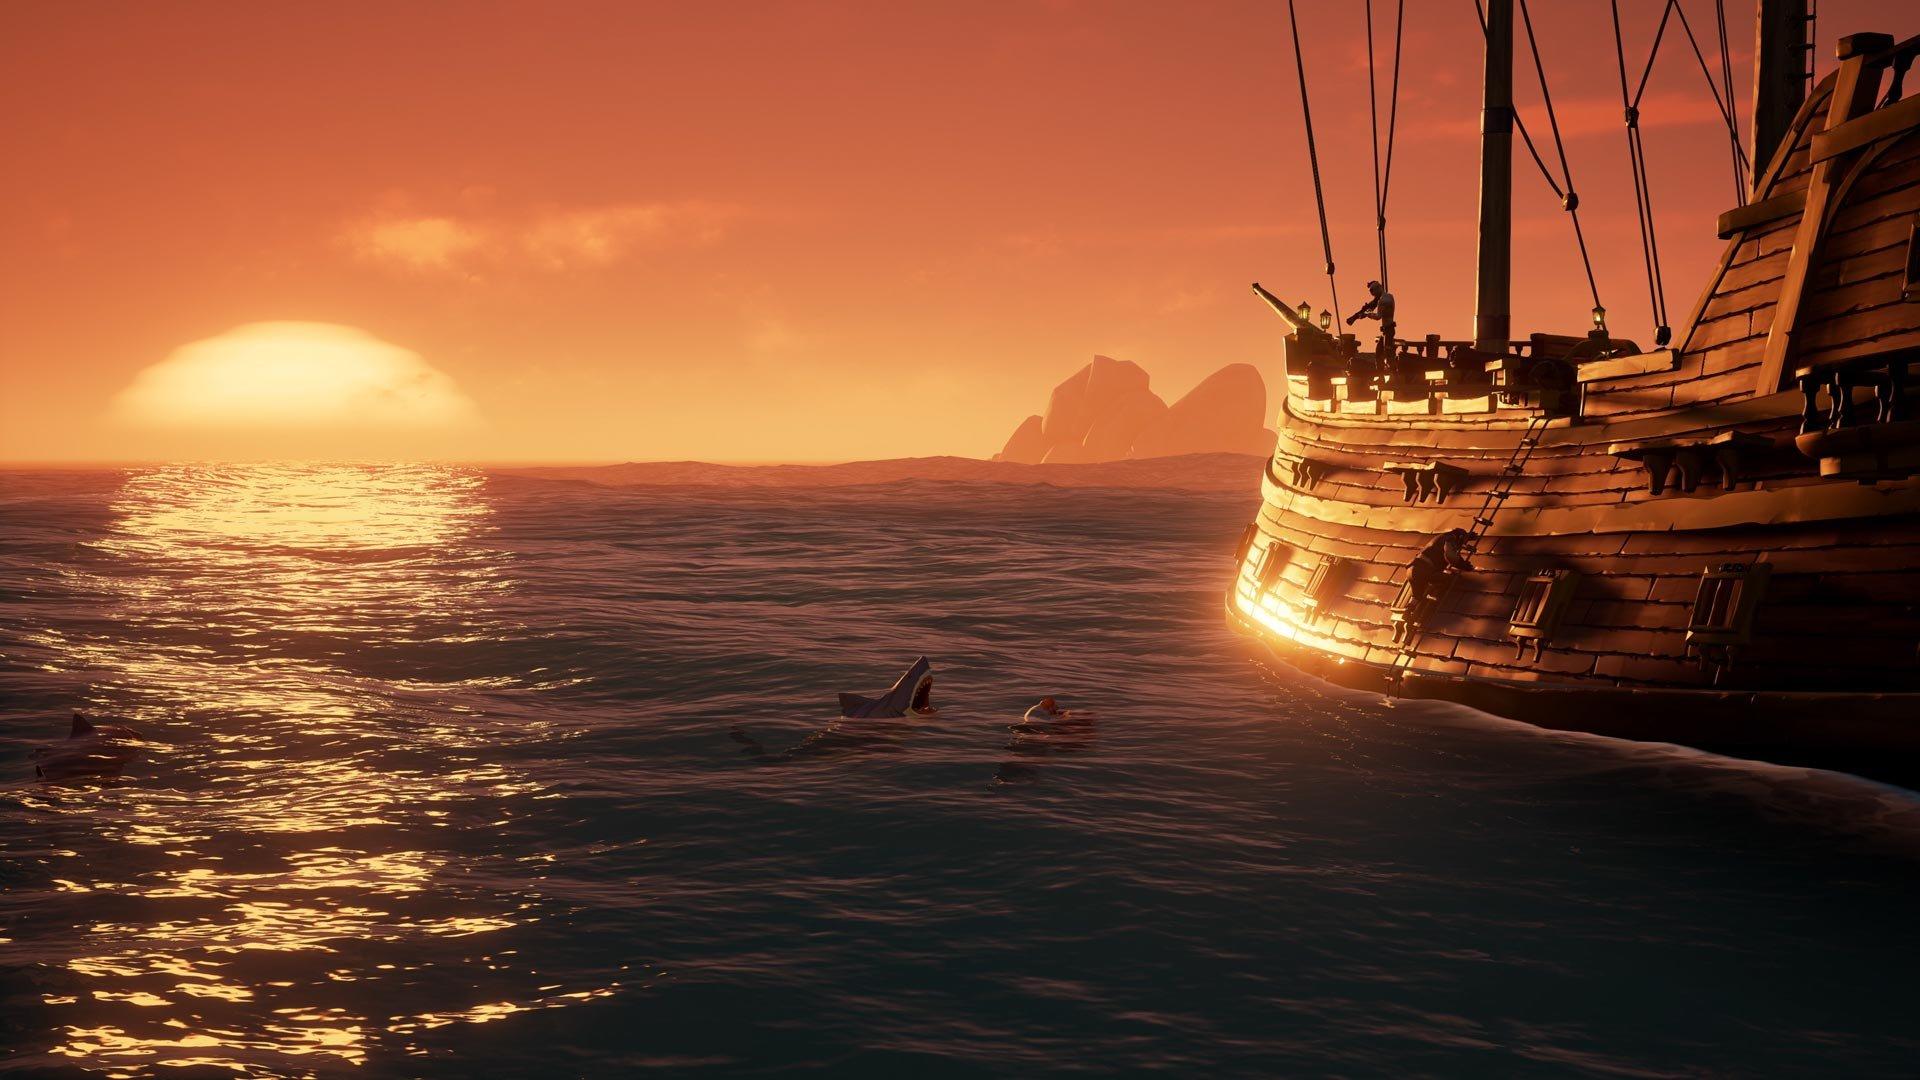 Sea of Thieves, которая была эсклюзивом для Microsoft вышла в Steam